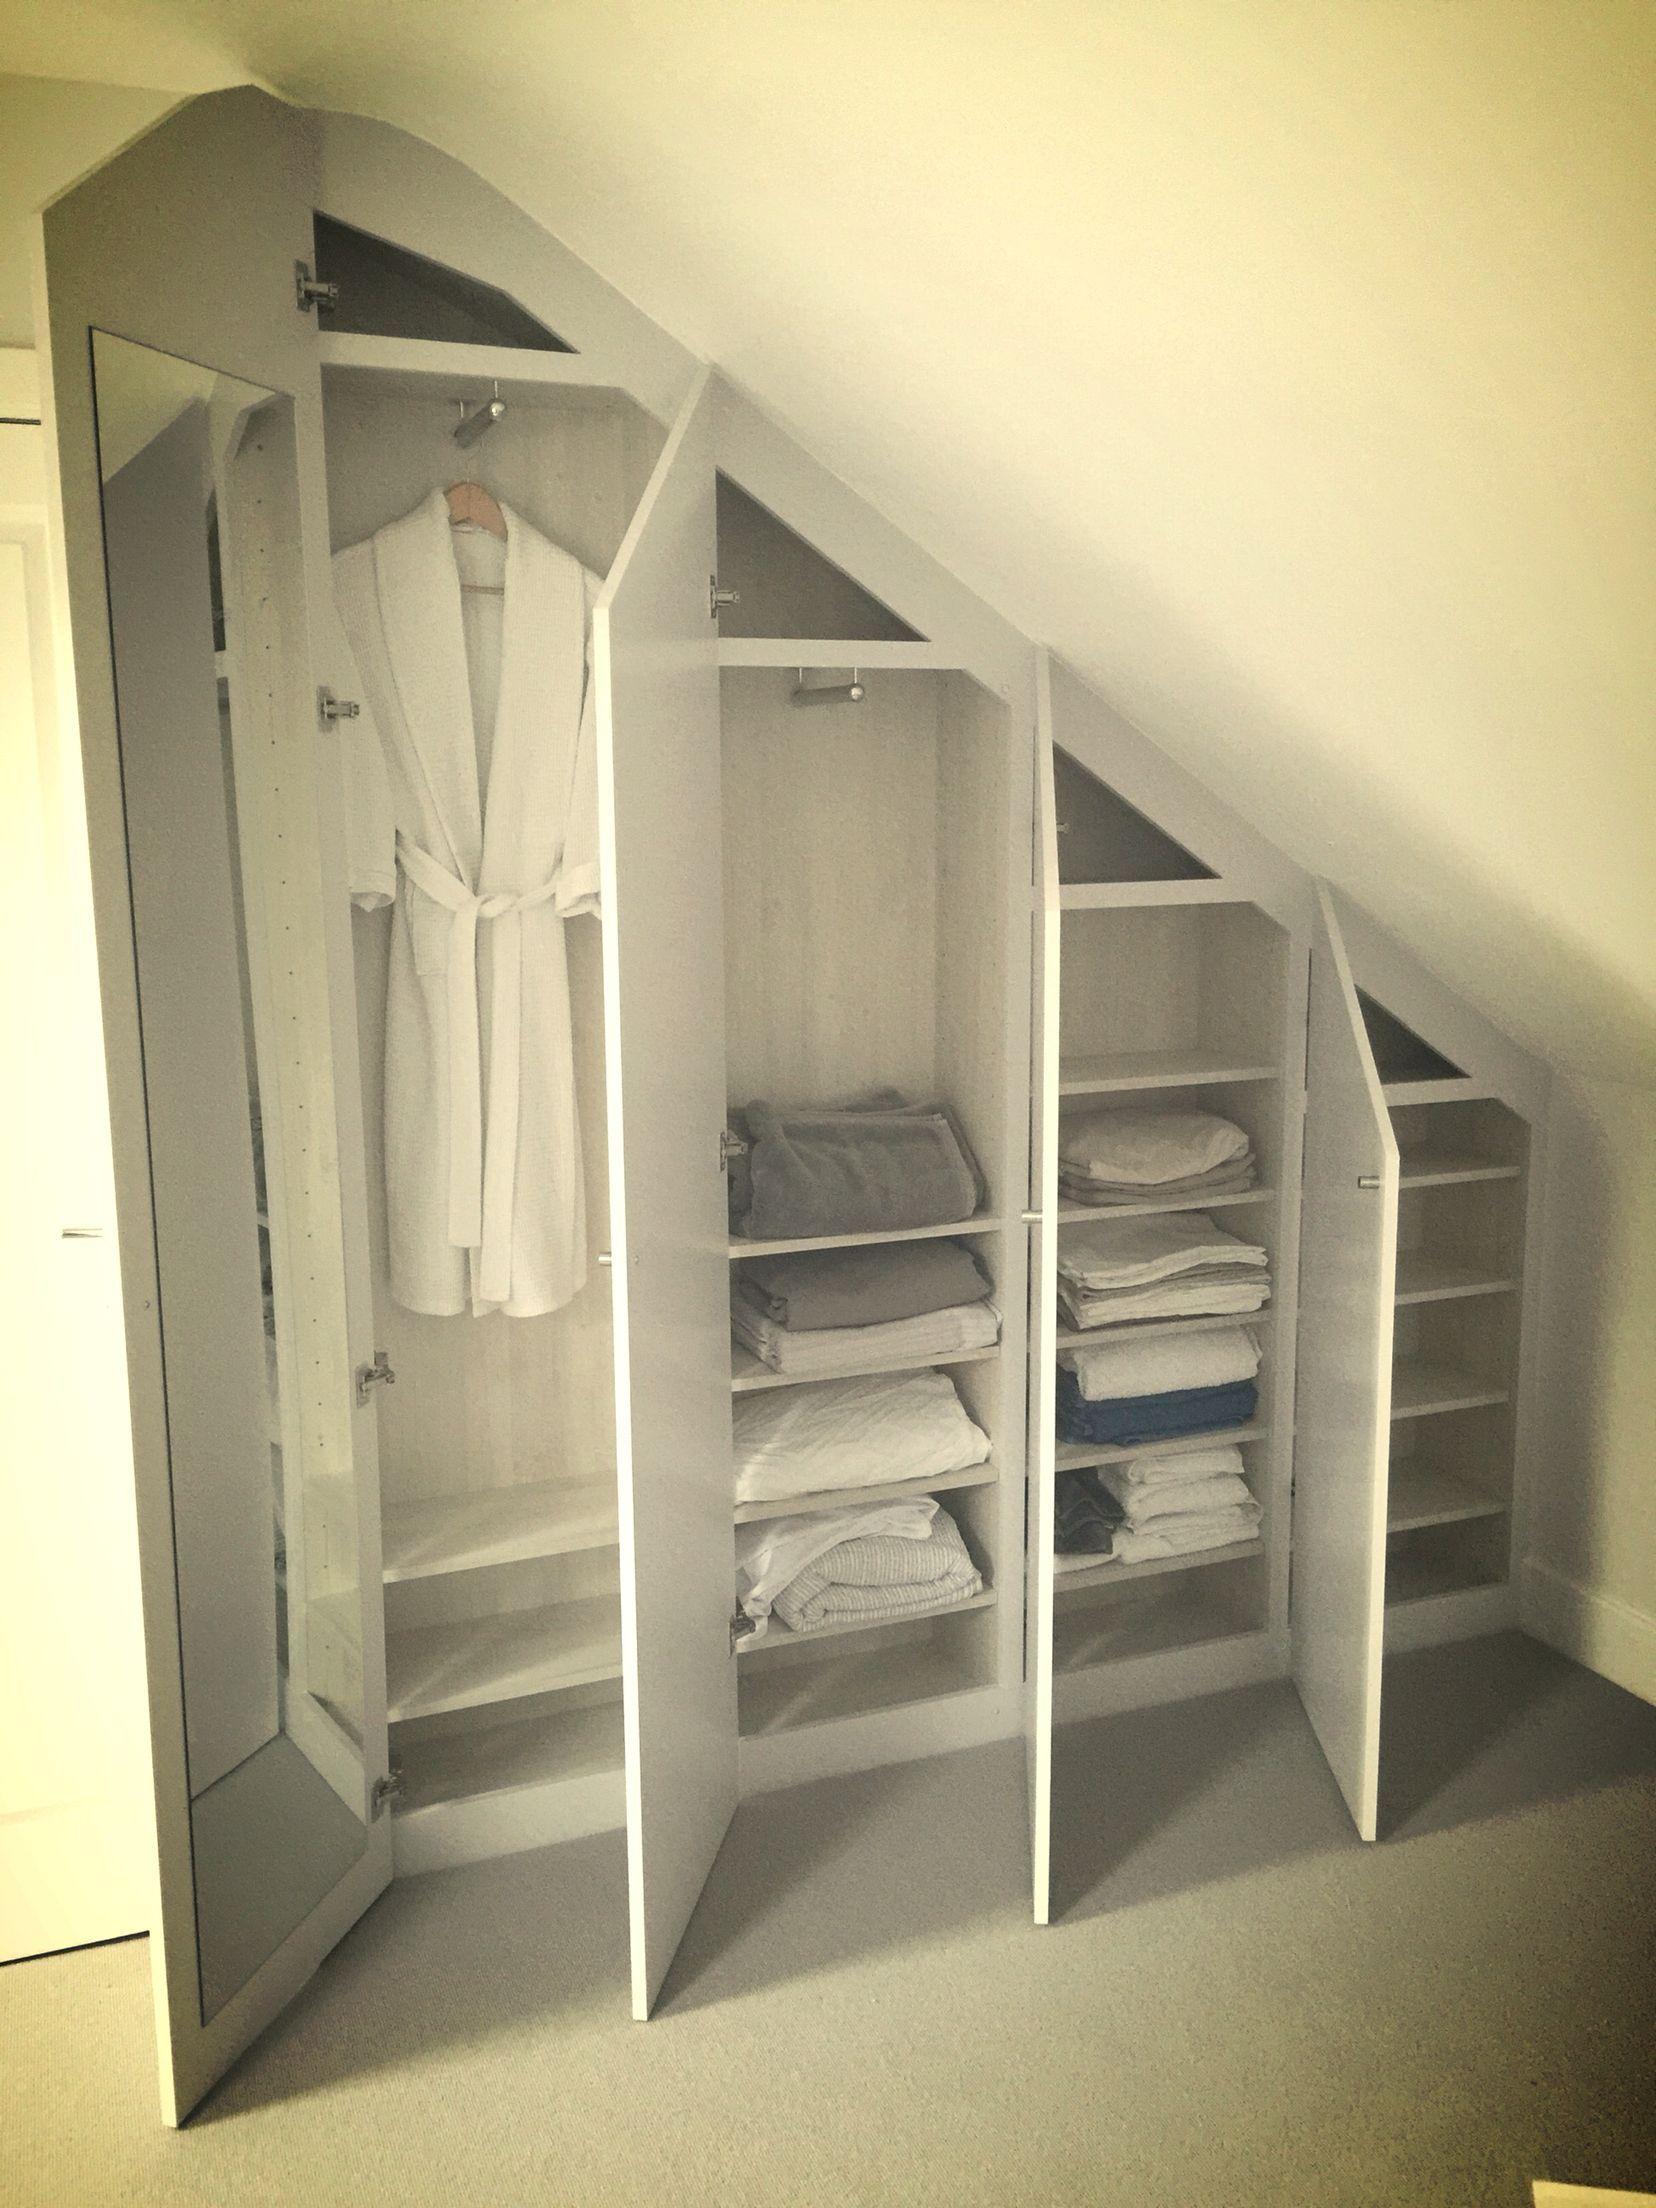 Loft bedroom wardrobe ideas  Wardrobe to fit in loft conversion  Teen boys bedroom ideas